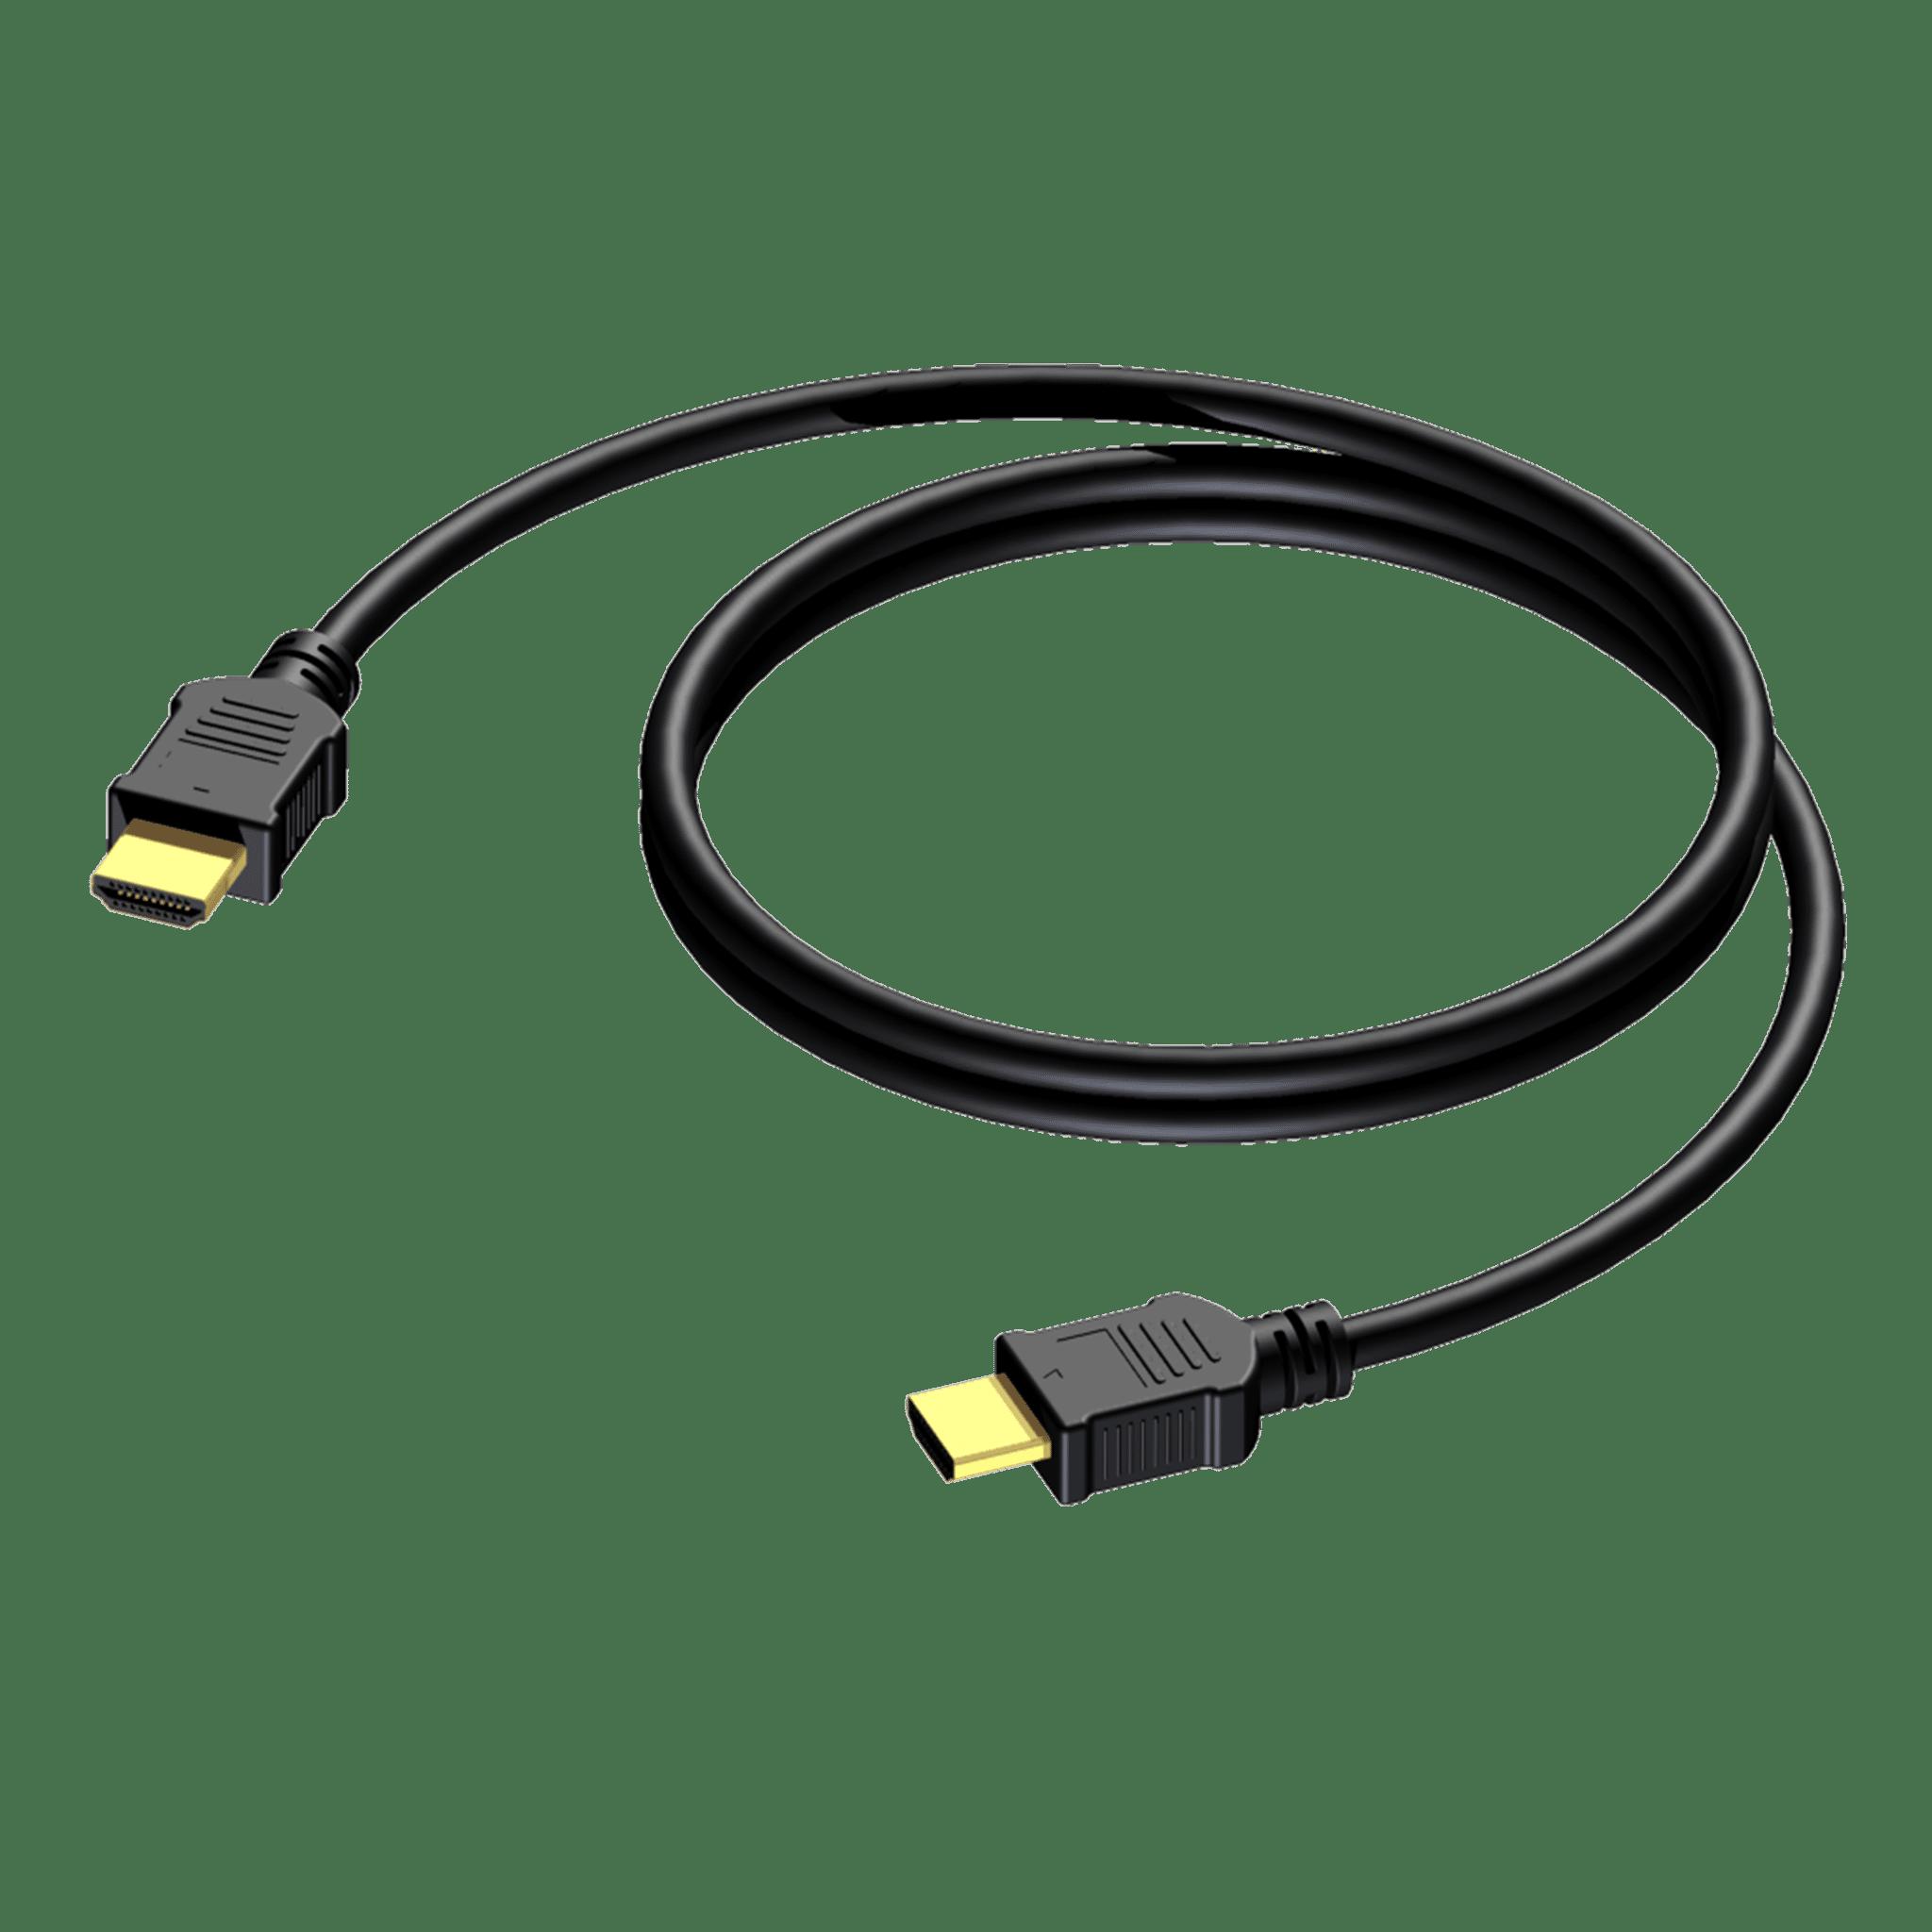 BSV110 - HDMI A male - HDMI A male